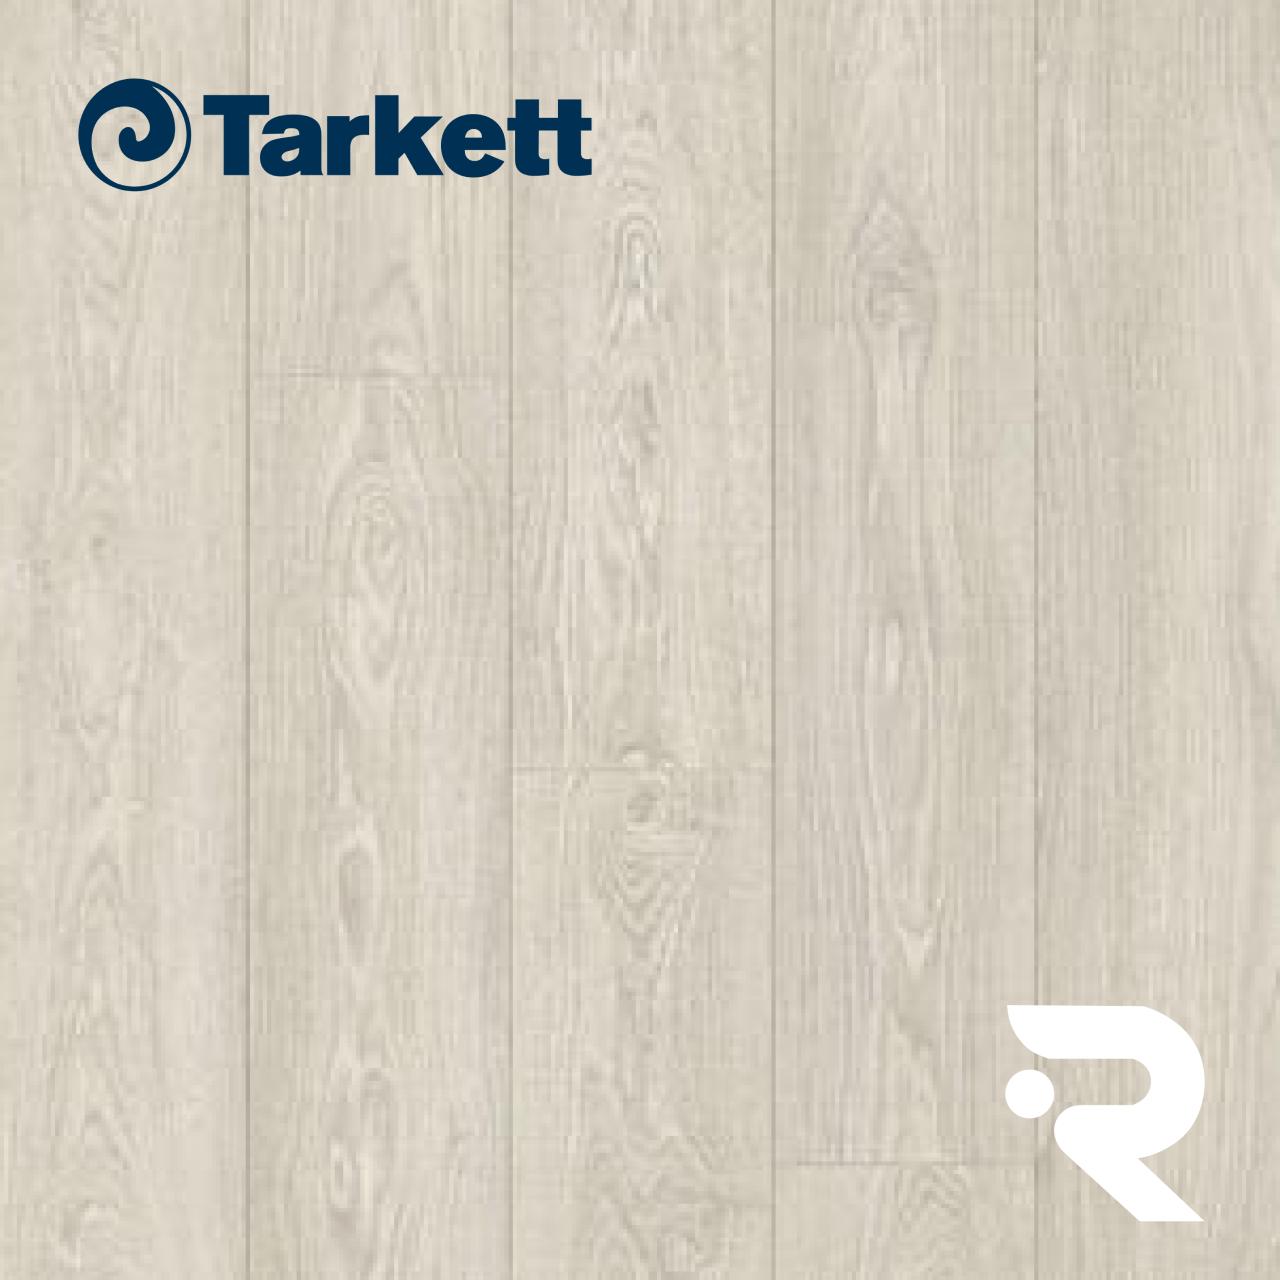 🌳 ПВХ плитка Tarkett | ModularT 7 - OAK STREET WHITE | Art Vinyl | 1200 x 200 мм